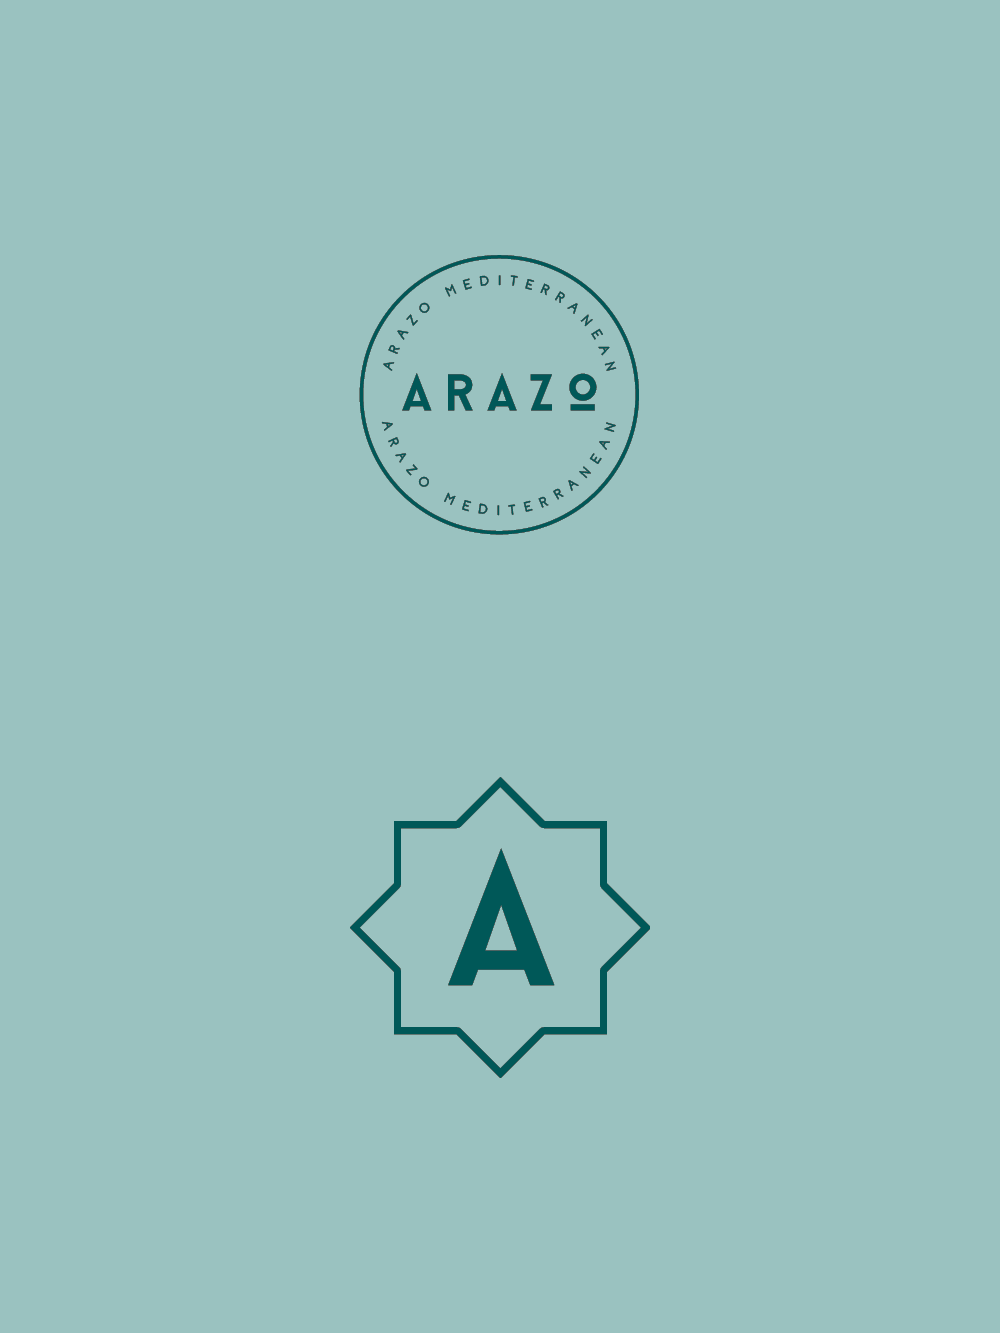 ARAZO_LeahSylviaCreative2.png